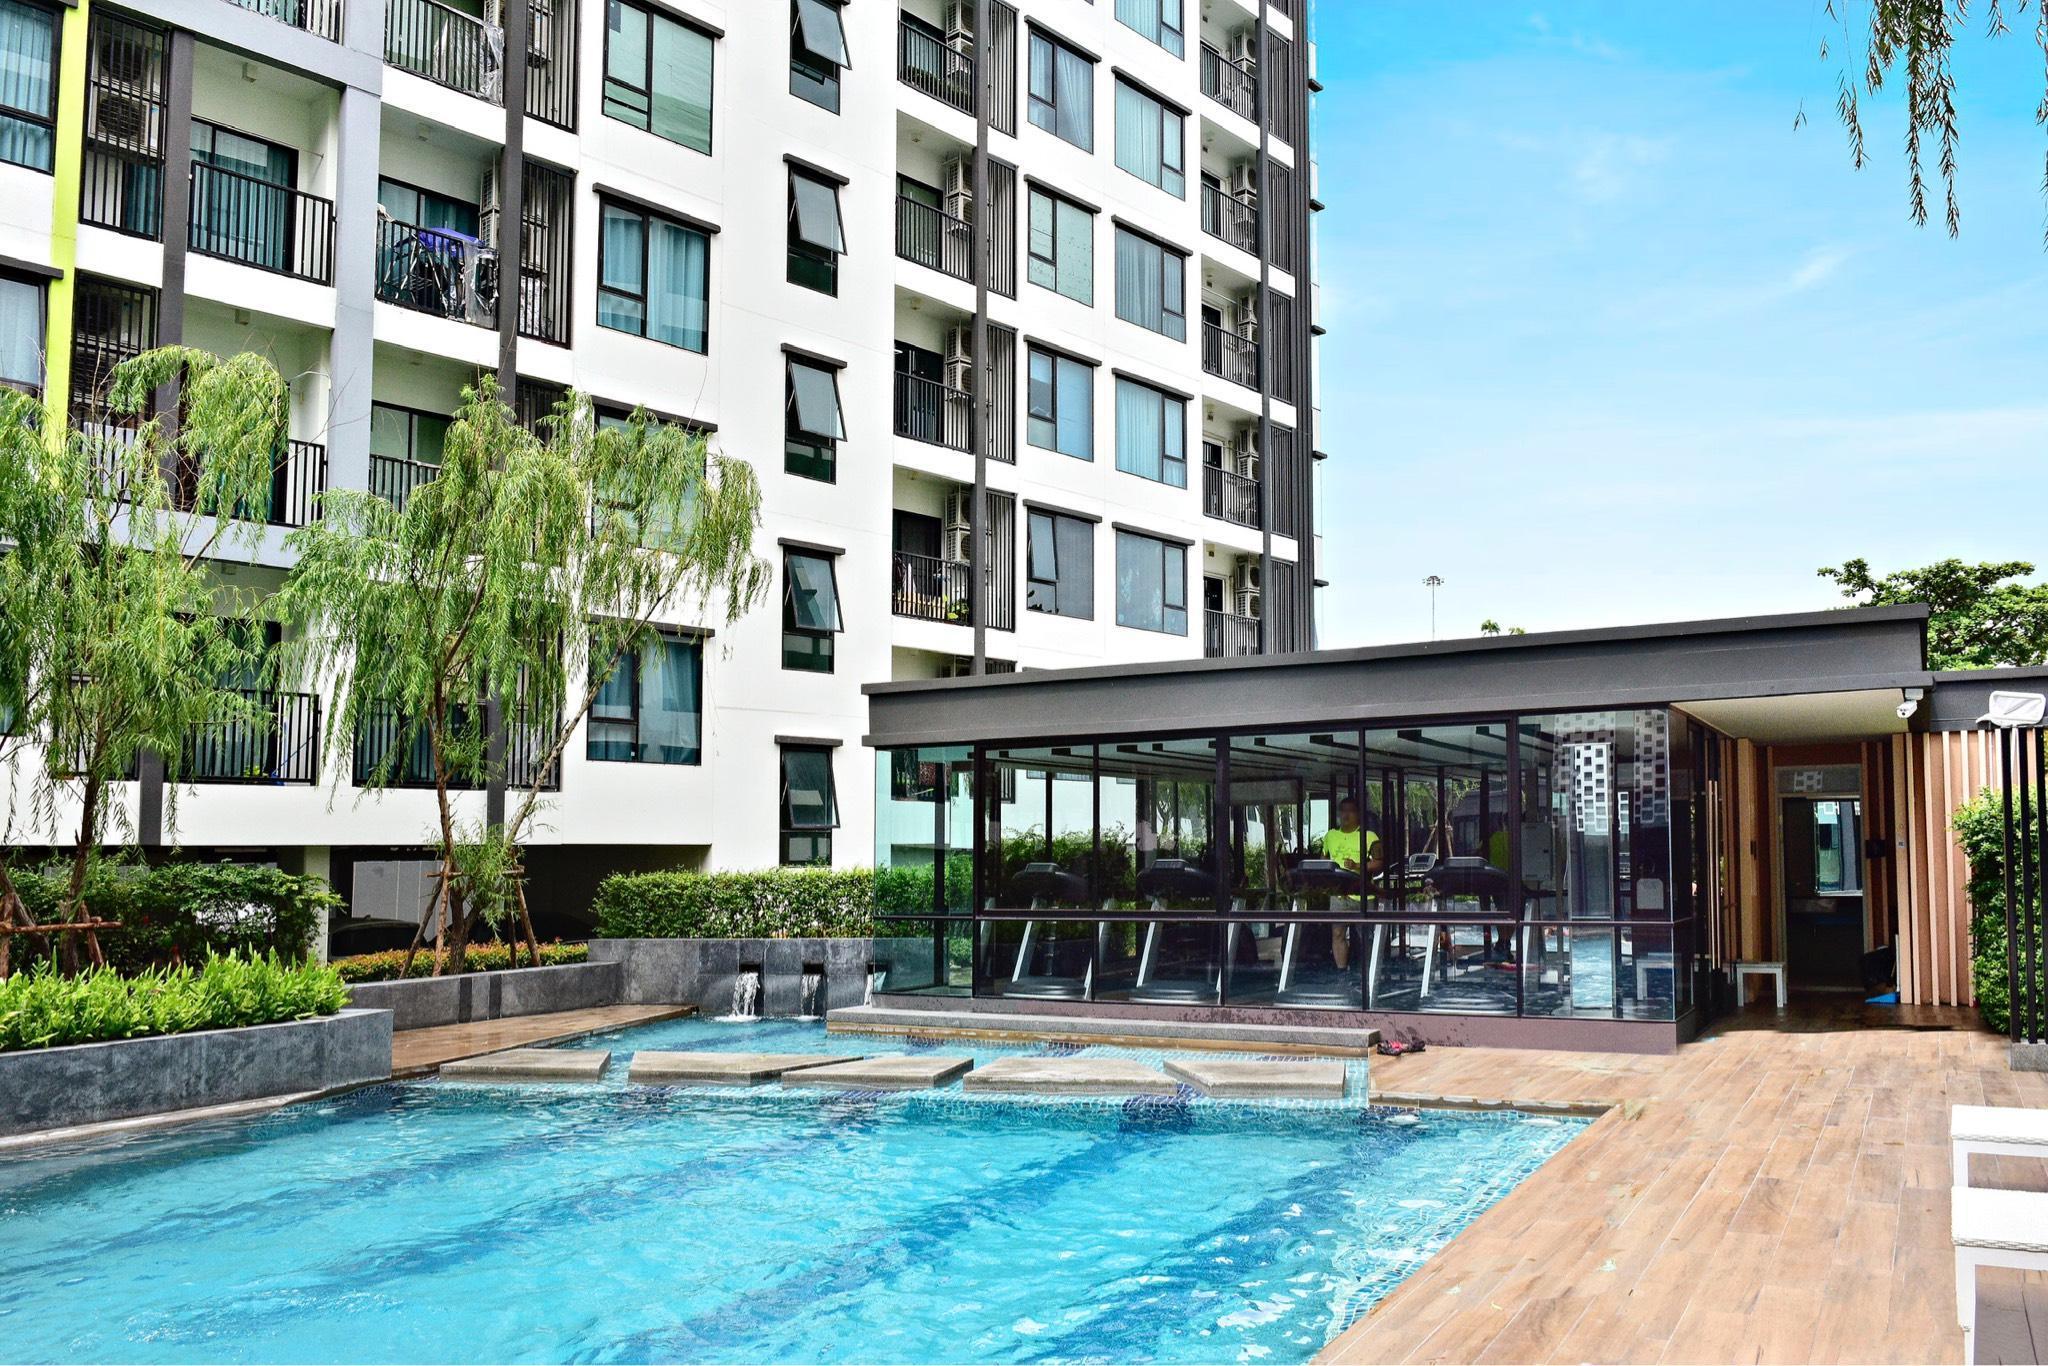 BTS Onnut Nice Mono Apartment Swimmingpool